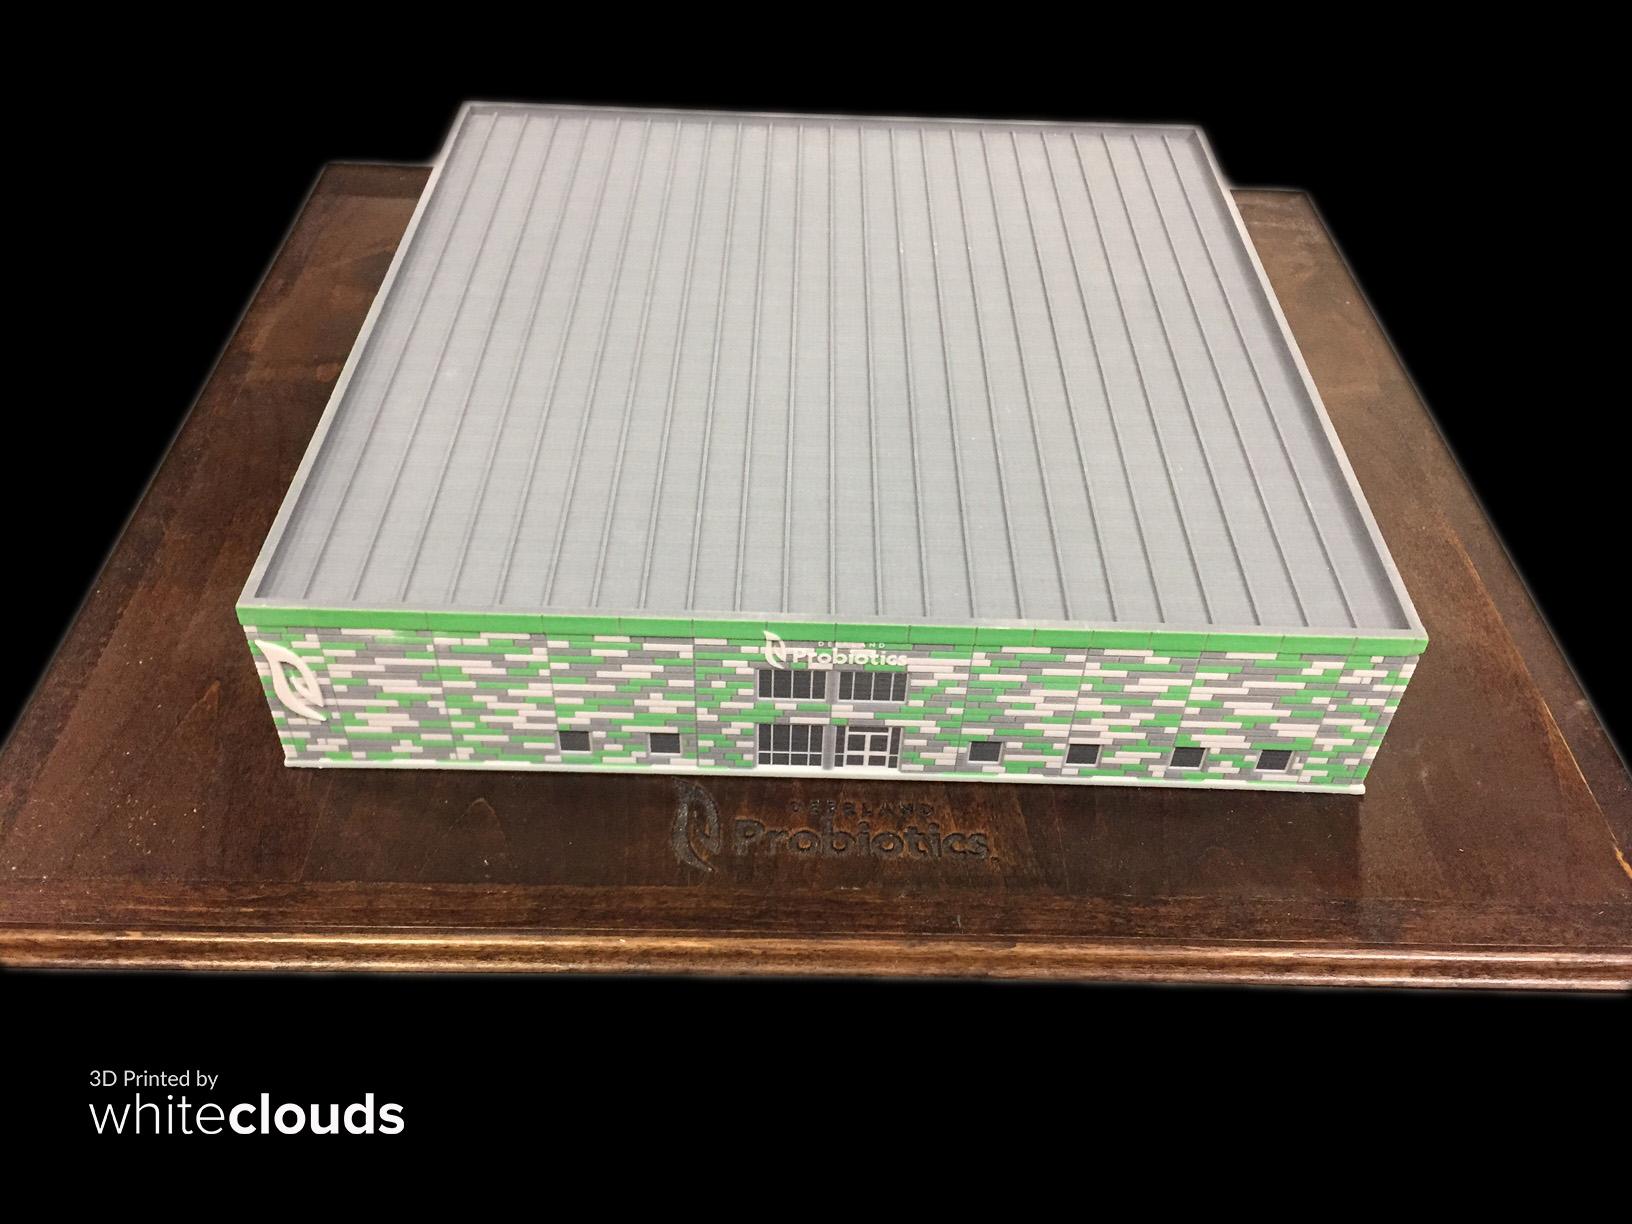 3D-Printed-WhiteClouds-Deerland-Architecture-Deerland-Website-1.JPG